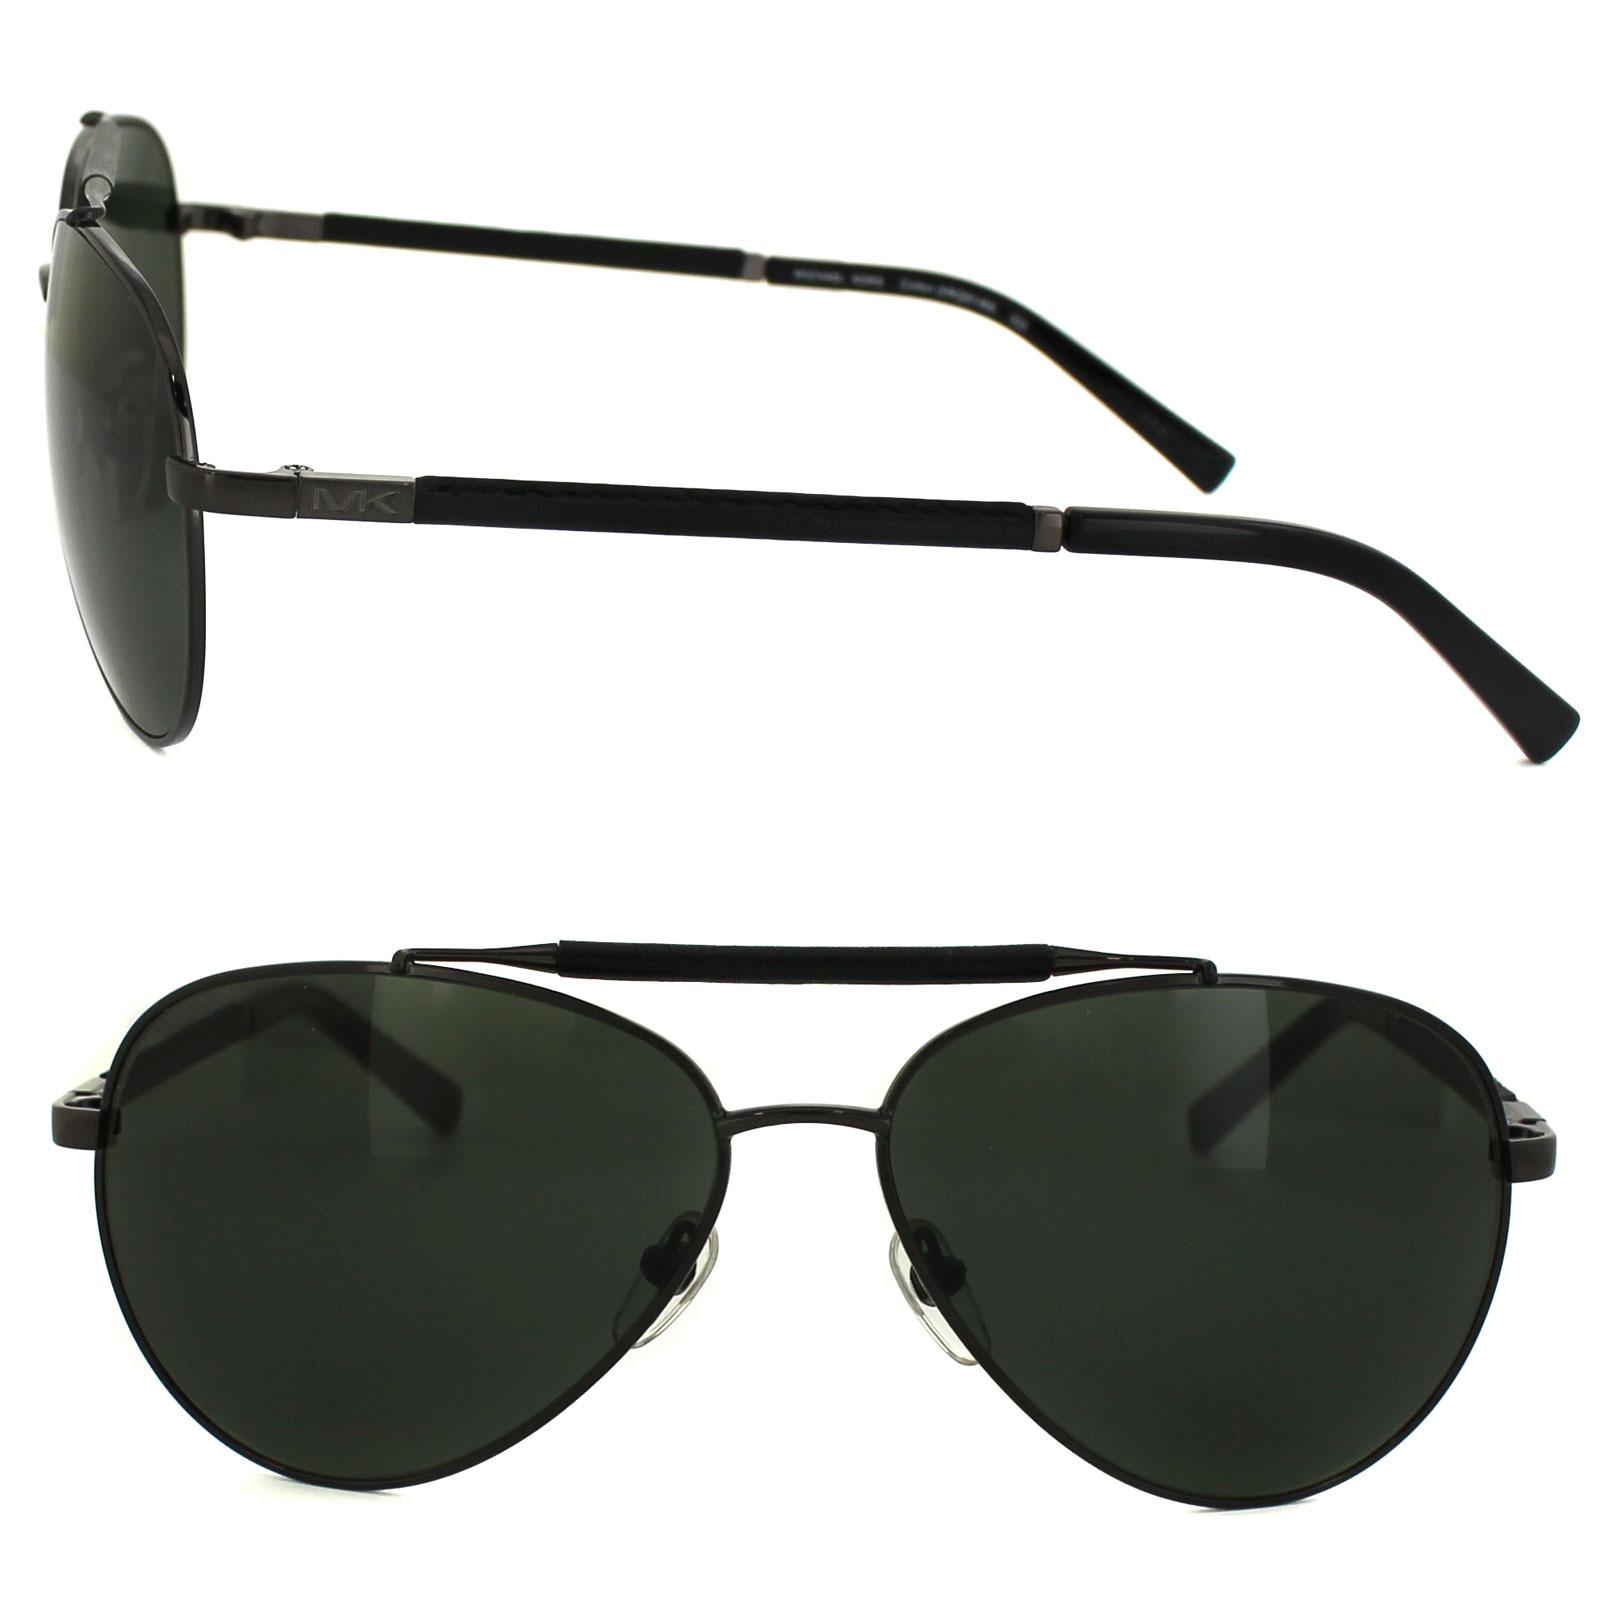 340fa7c68f Michael Kors Colton MKS914M Sunglasses Thumbnail 1 Michael Kors Colton  MKS914M Sunglasses Thumbnail 2 ...